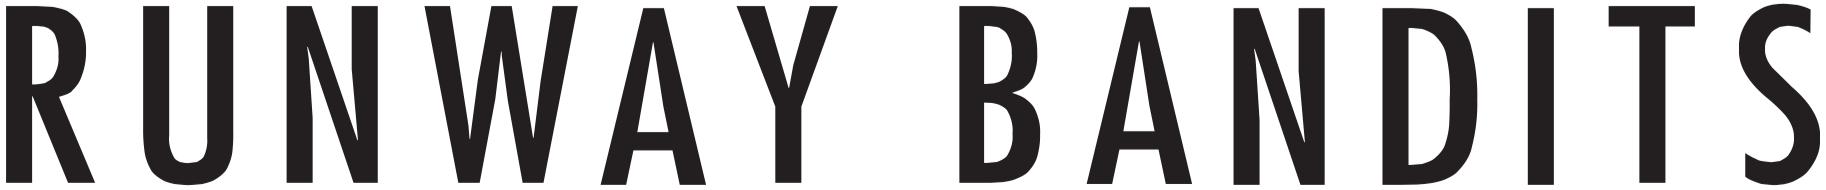 runway bandits logo